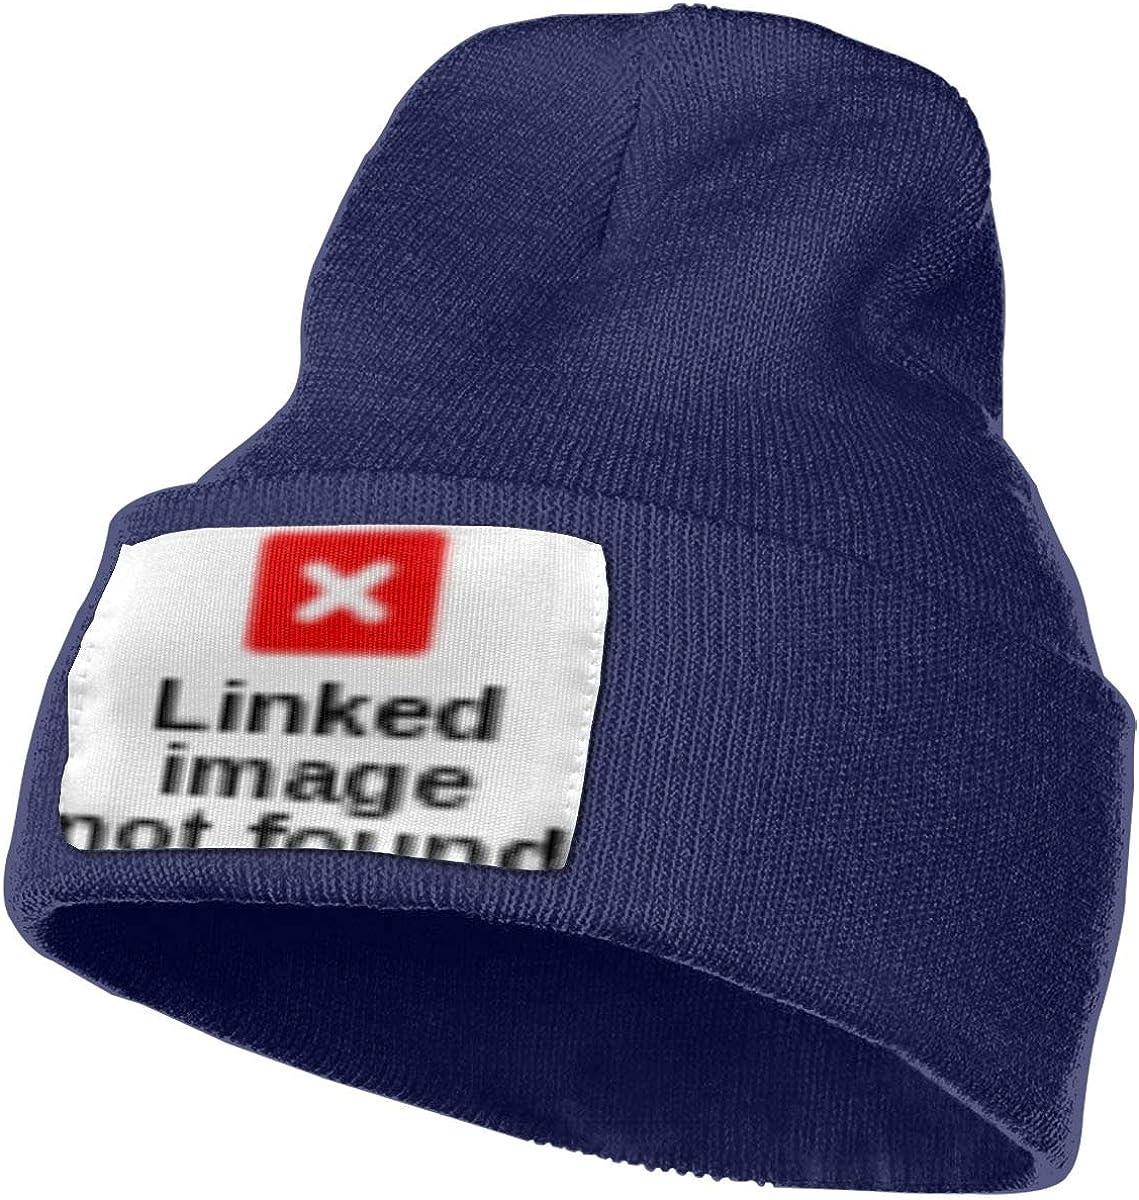 QZqDQ Abstract Geometric Circles Unisex Fashion Knitted Hat Luxury Hip-Hop Cap